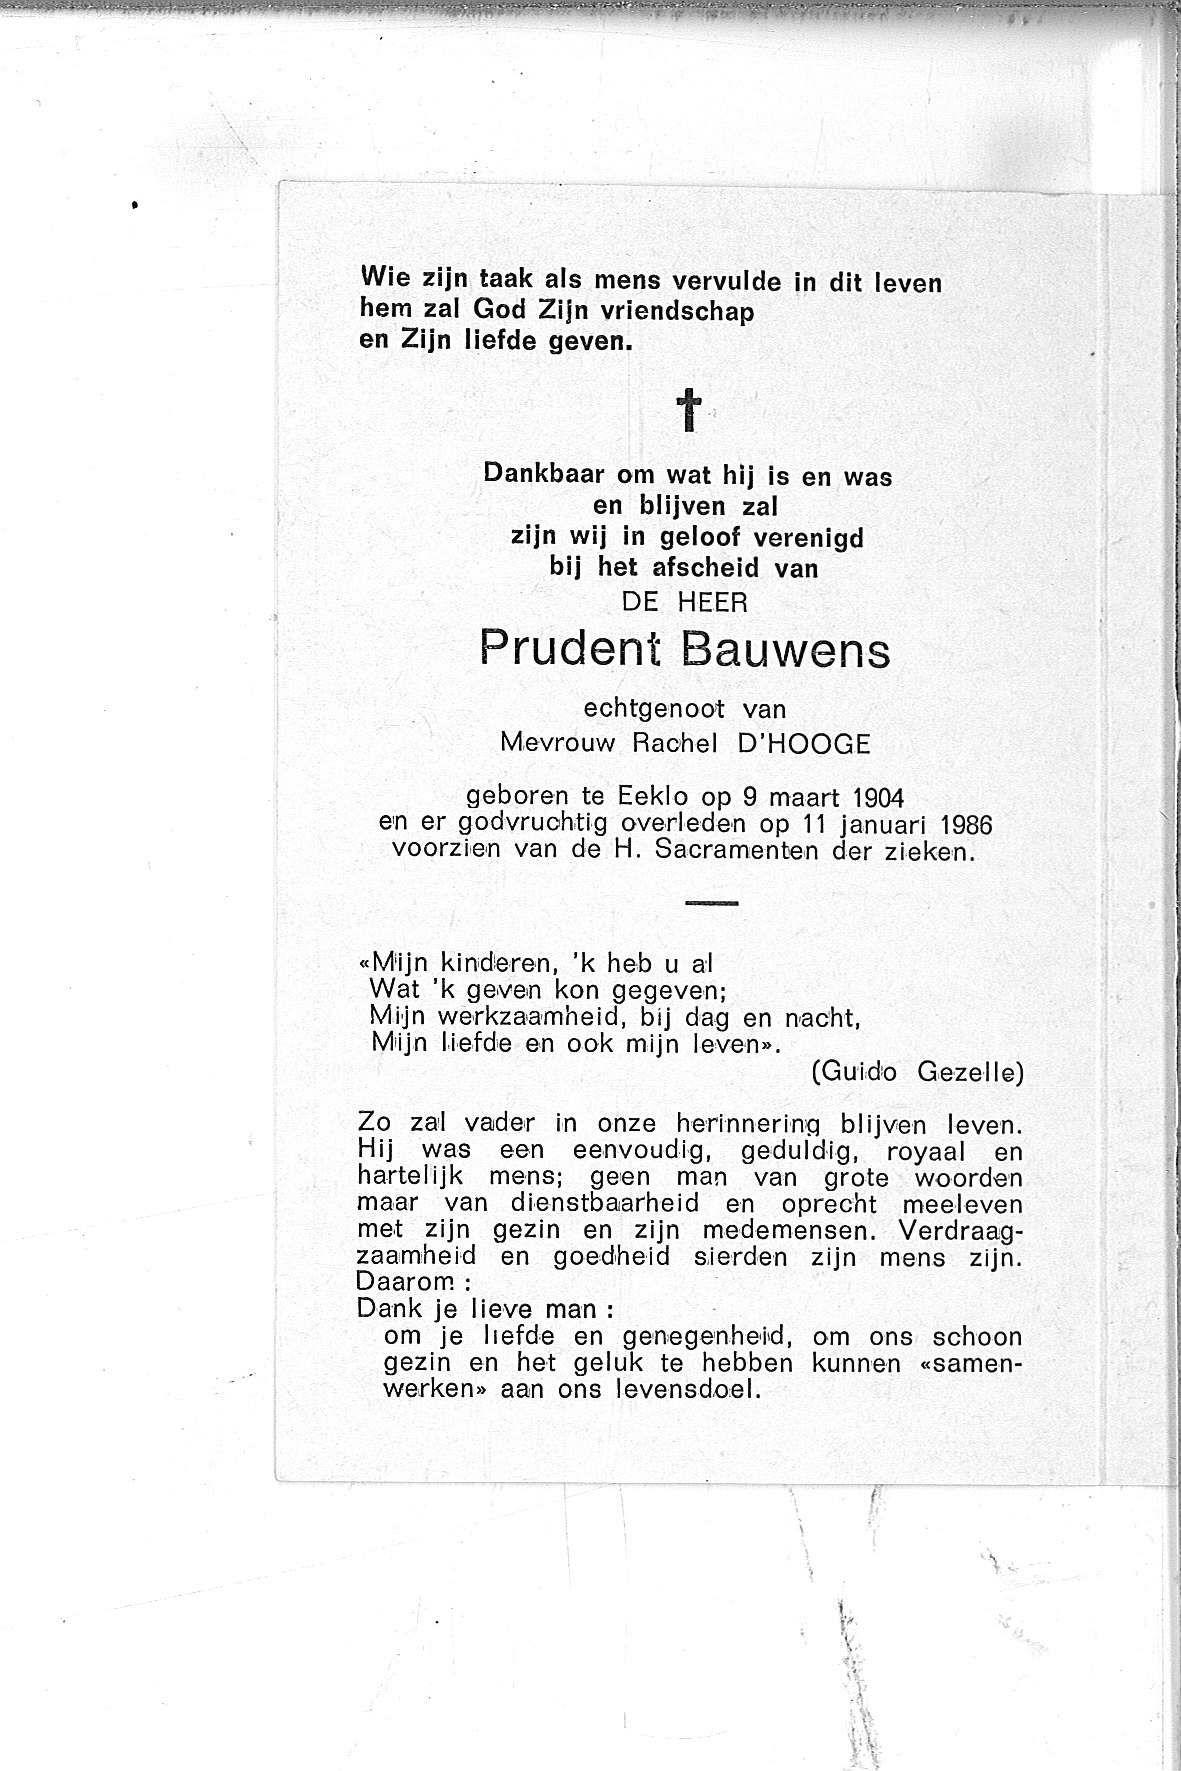 Prudent(1986)20130828133432_00059.jpg